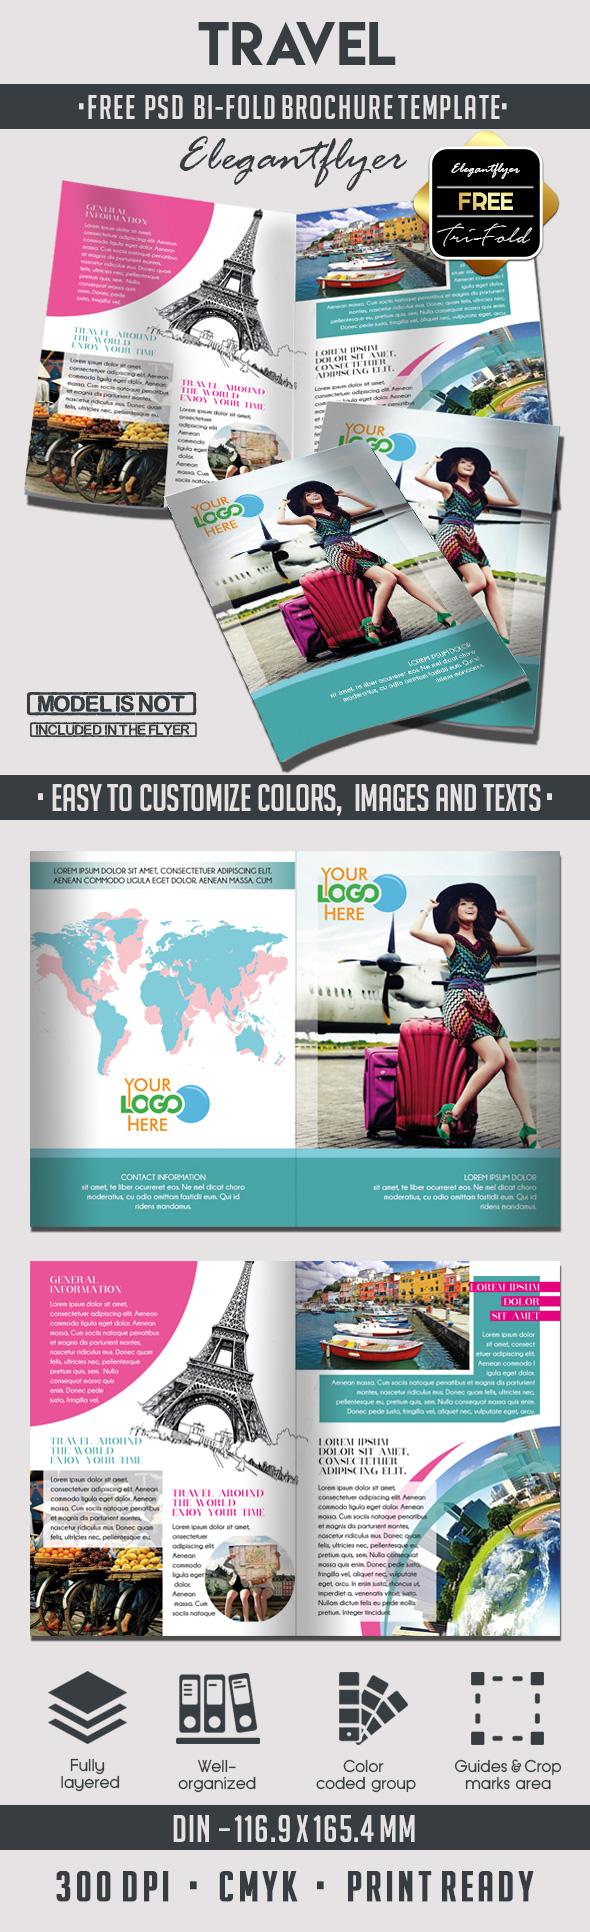 double fold brochure template